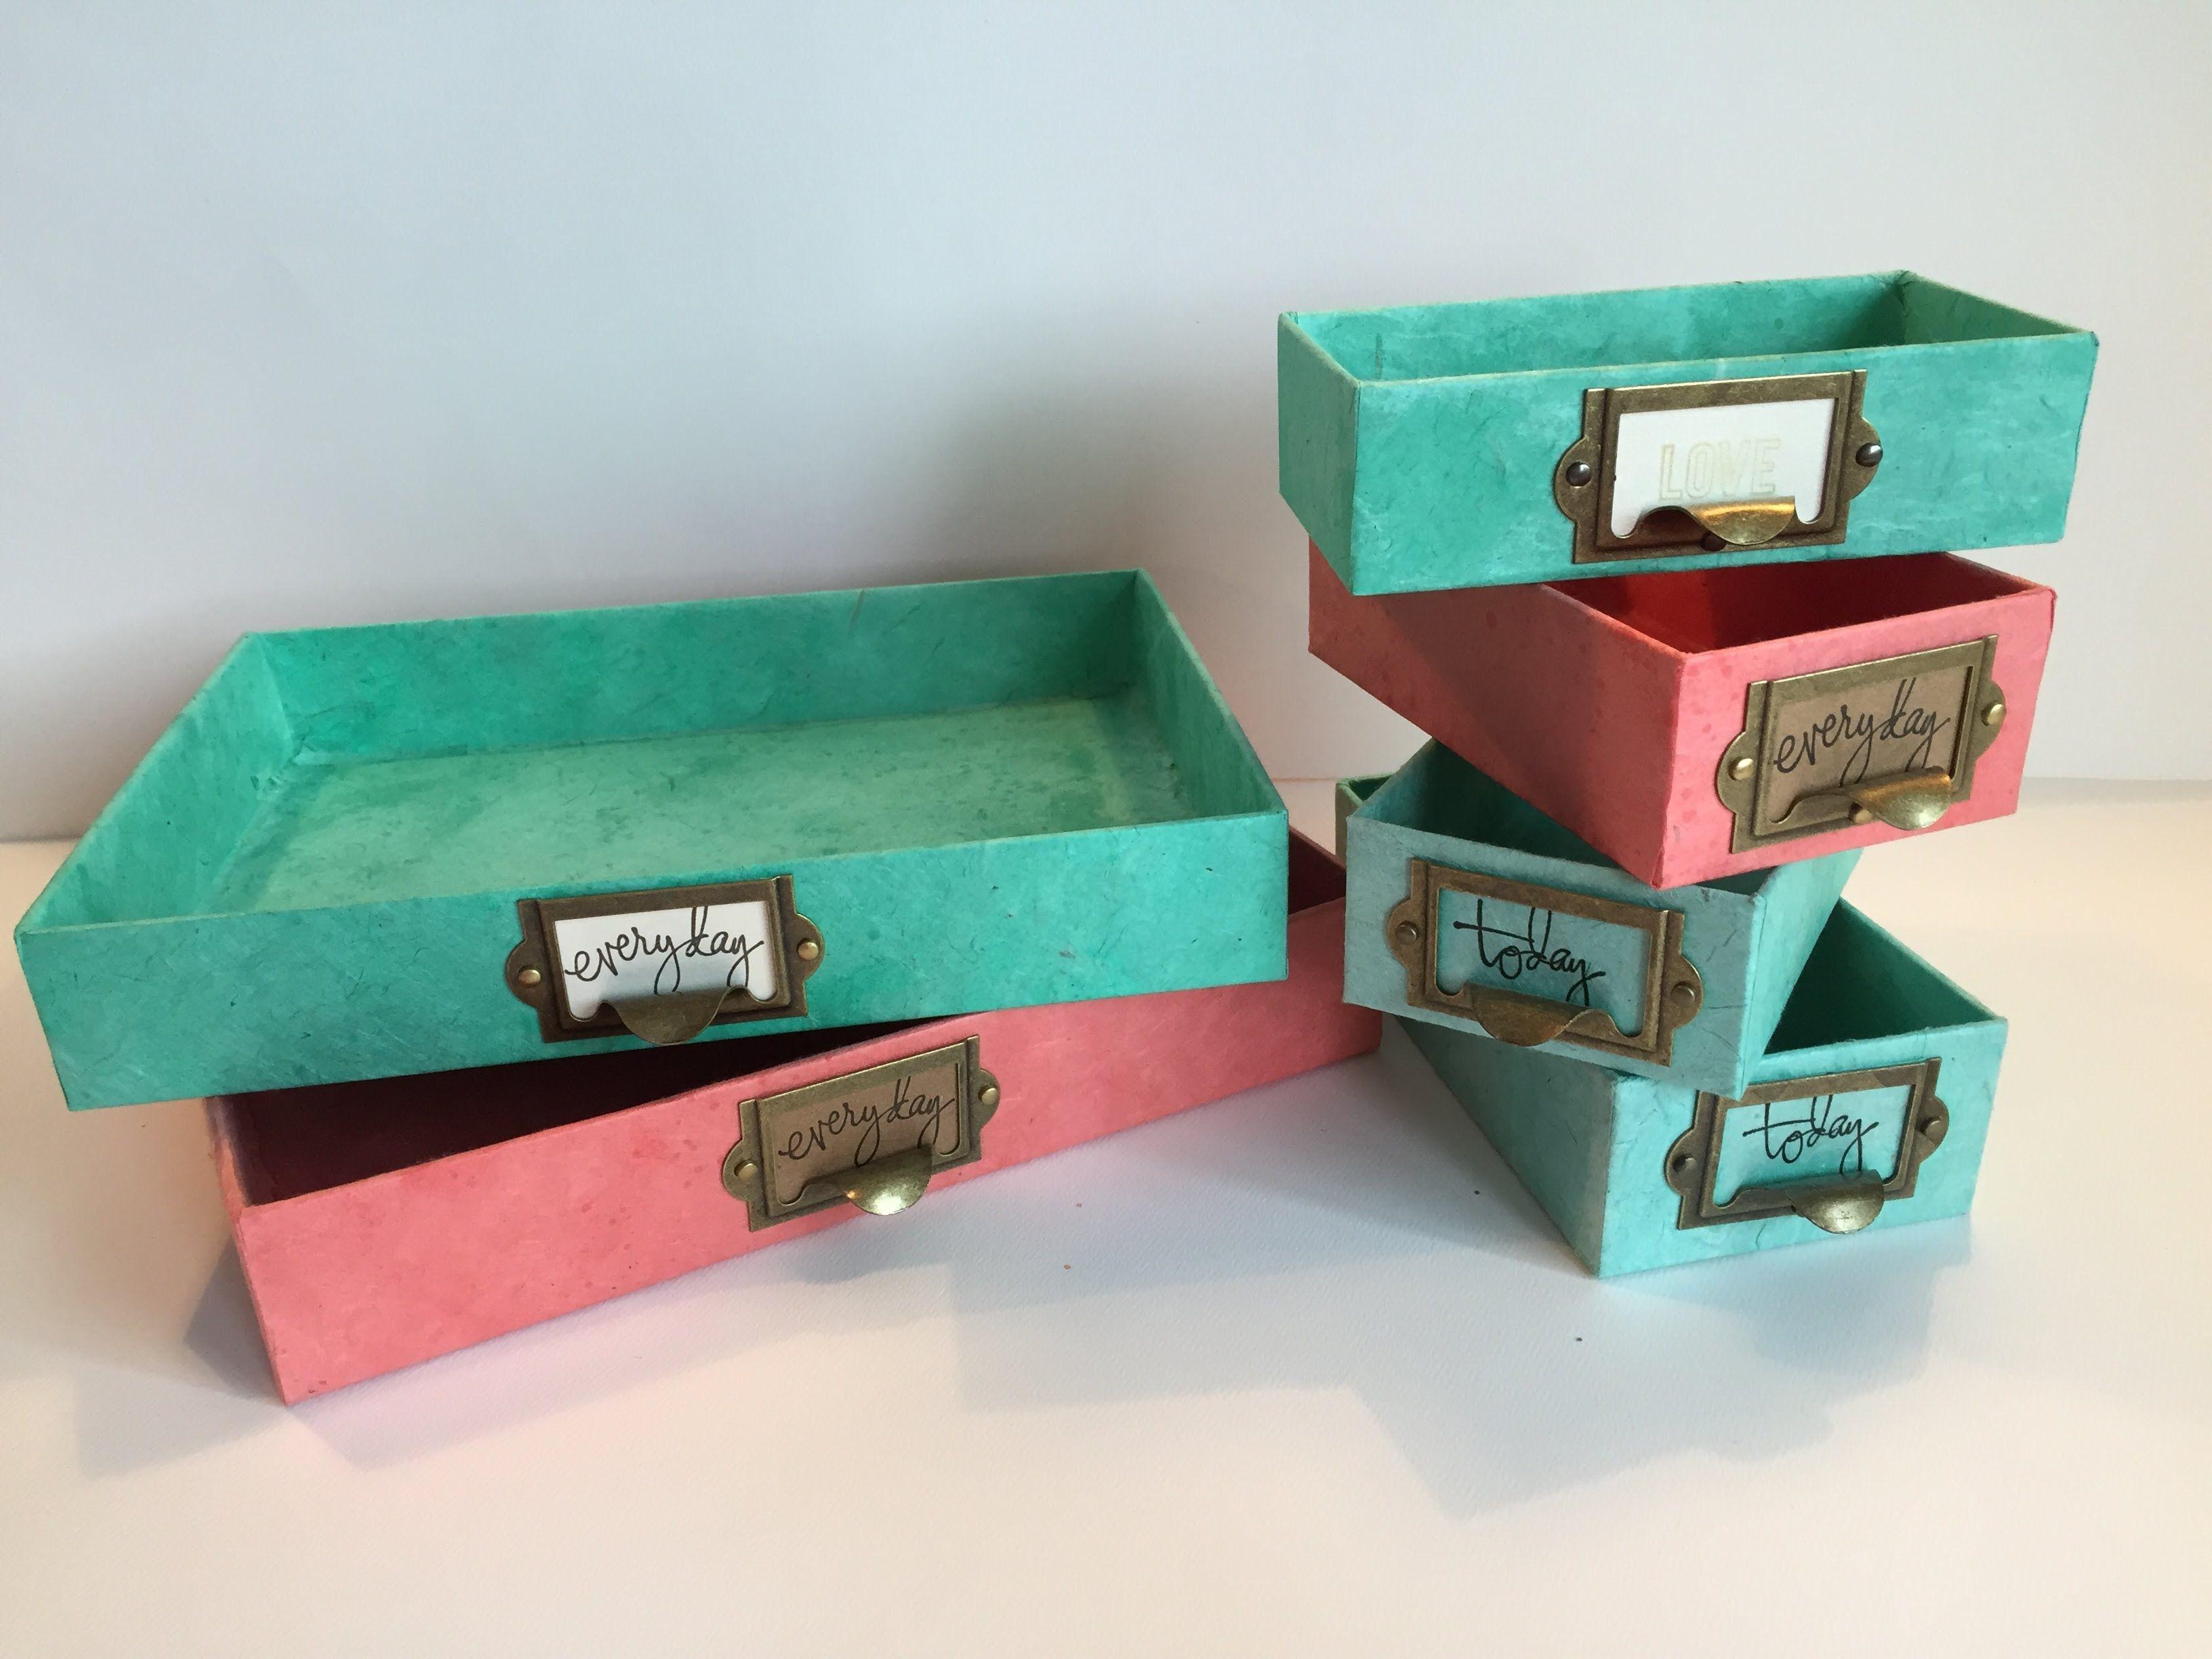 upcycle an iphone box diy tutorial reciclaje de carton pinterest diy tutorial upcycle. Black Bedroom Furniture Sets. Home Design Ideas